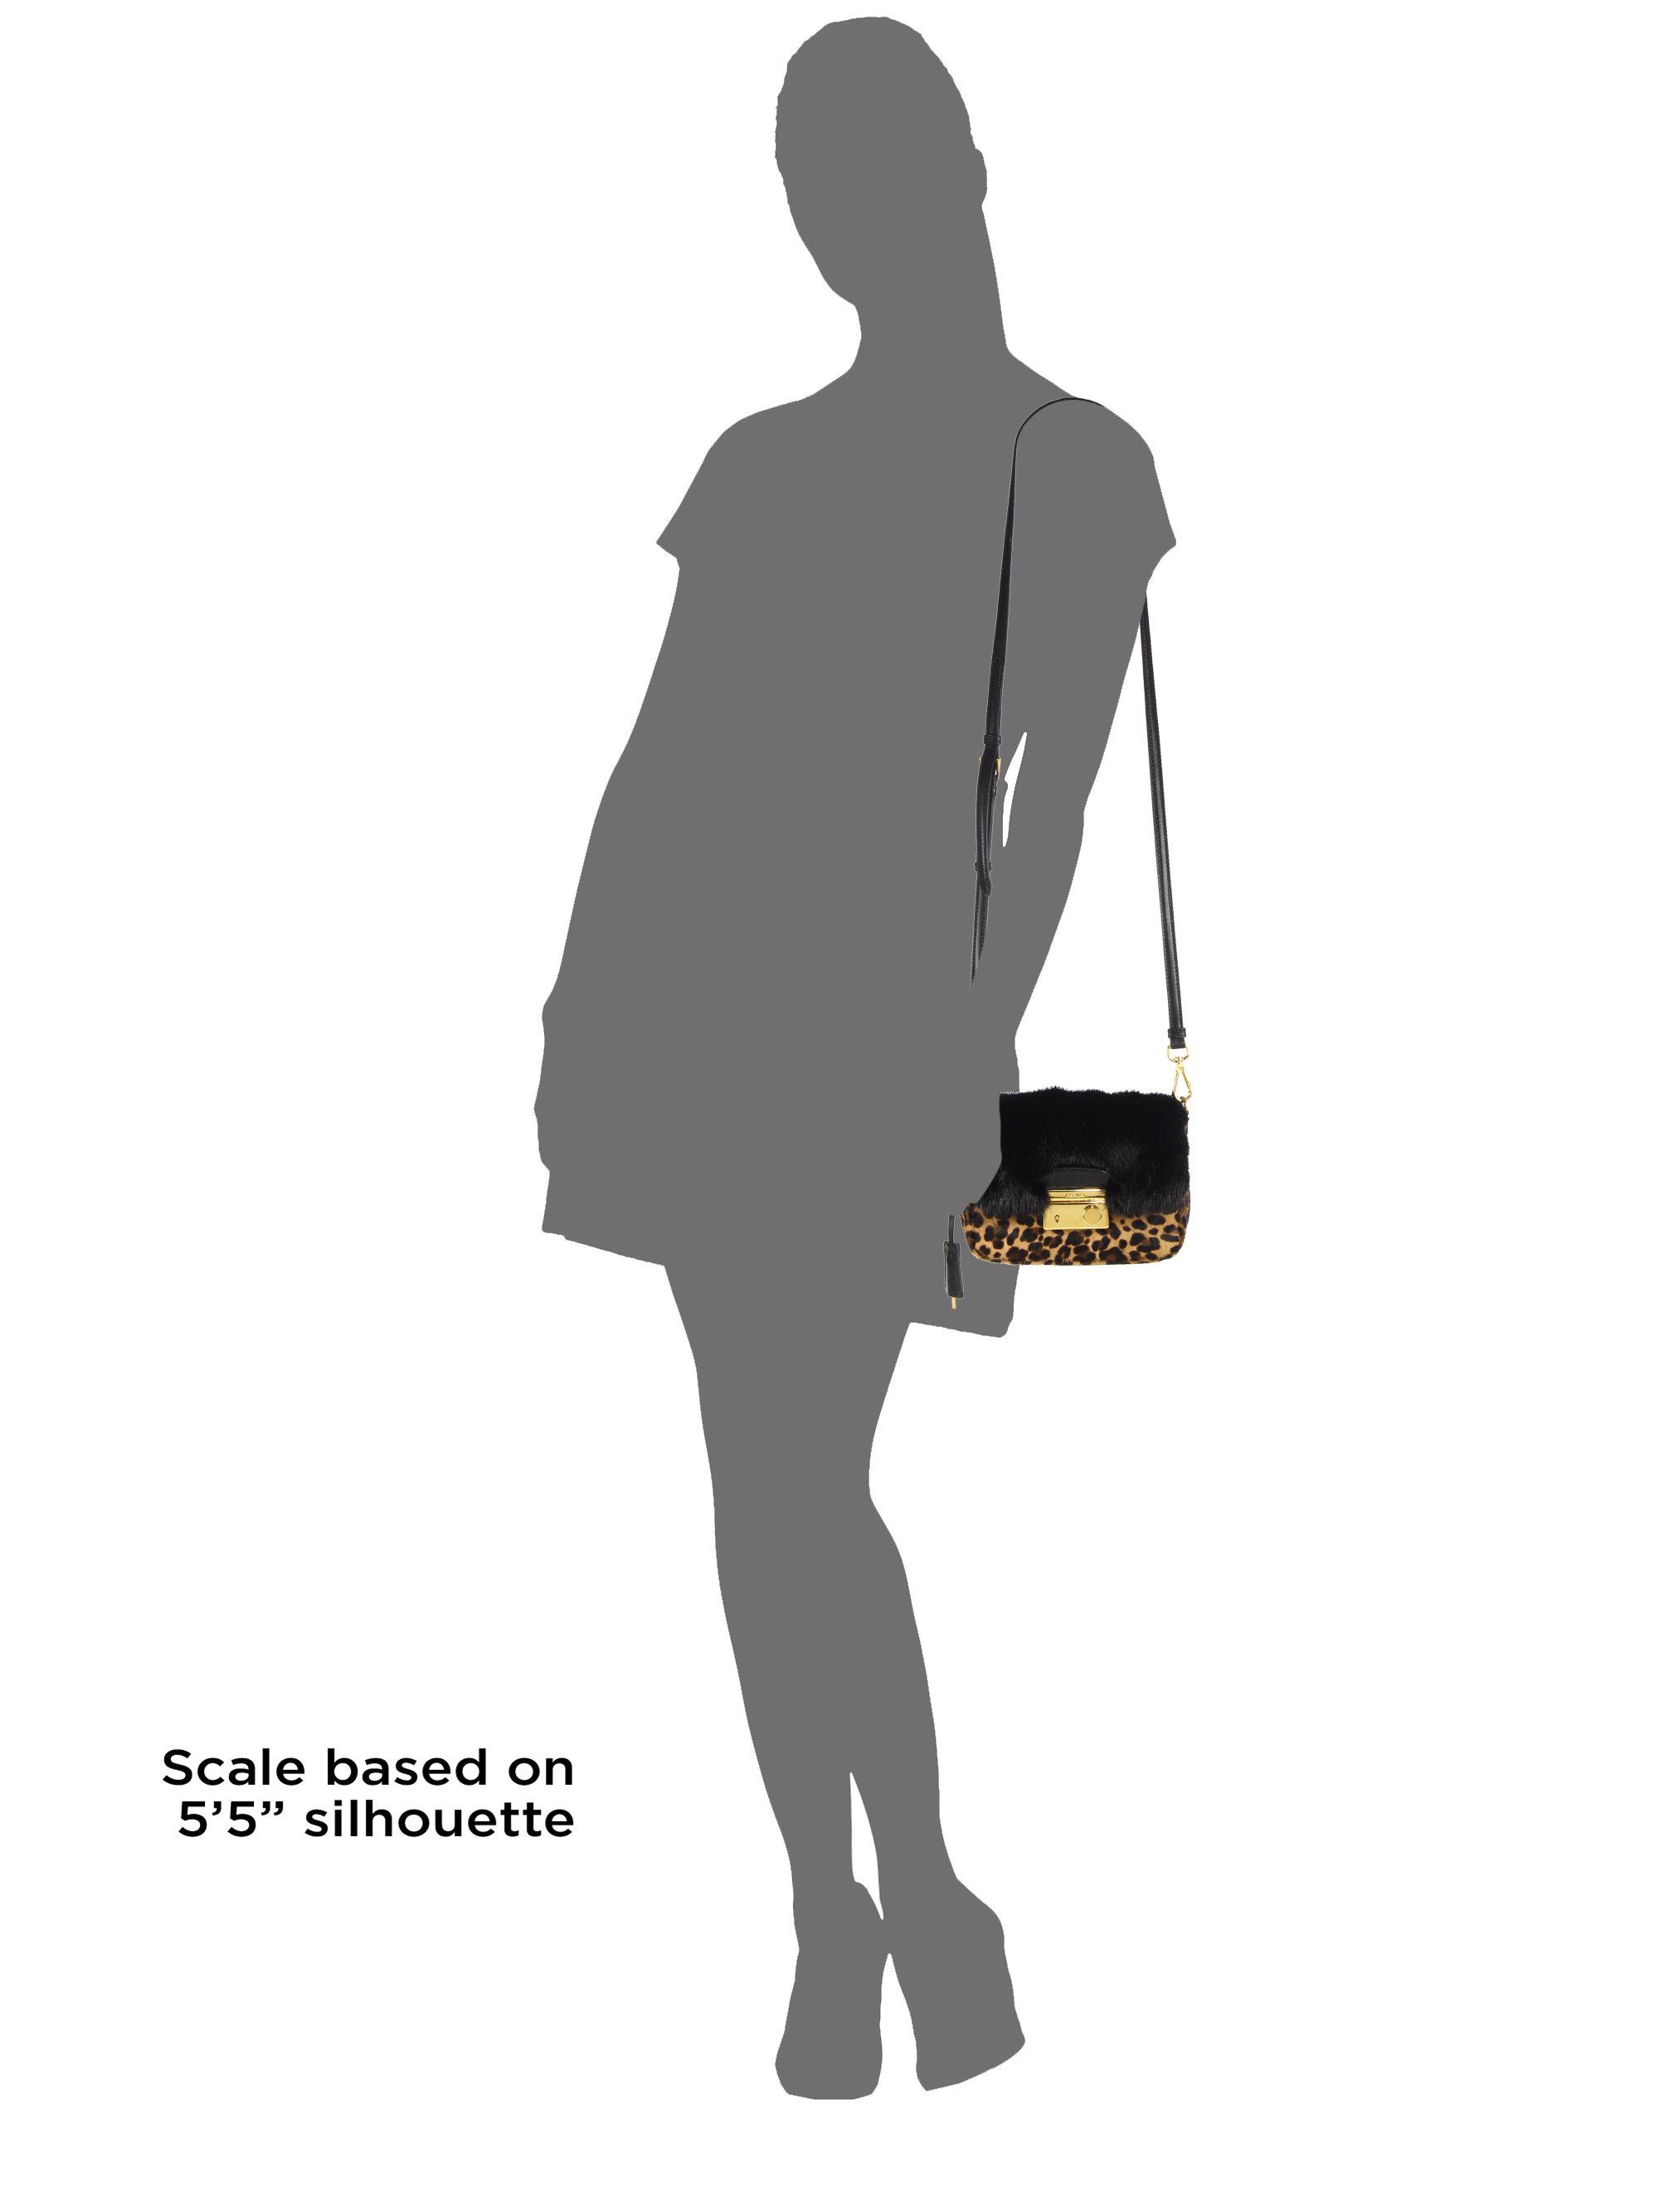 Prada Cavallino \u0026amp; Mink Fur Crossbody Bag in Black (LEOPARD) | Lyst